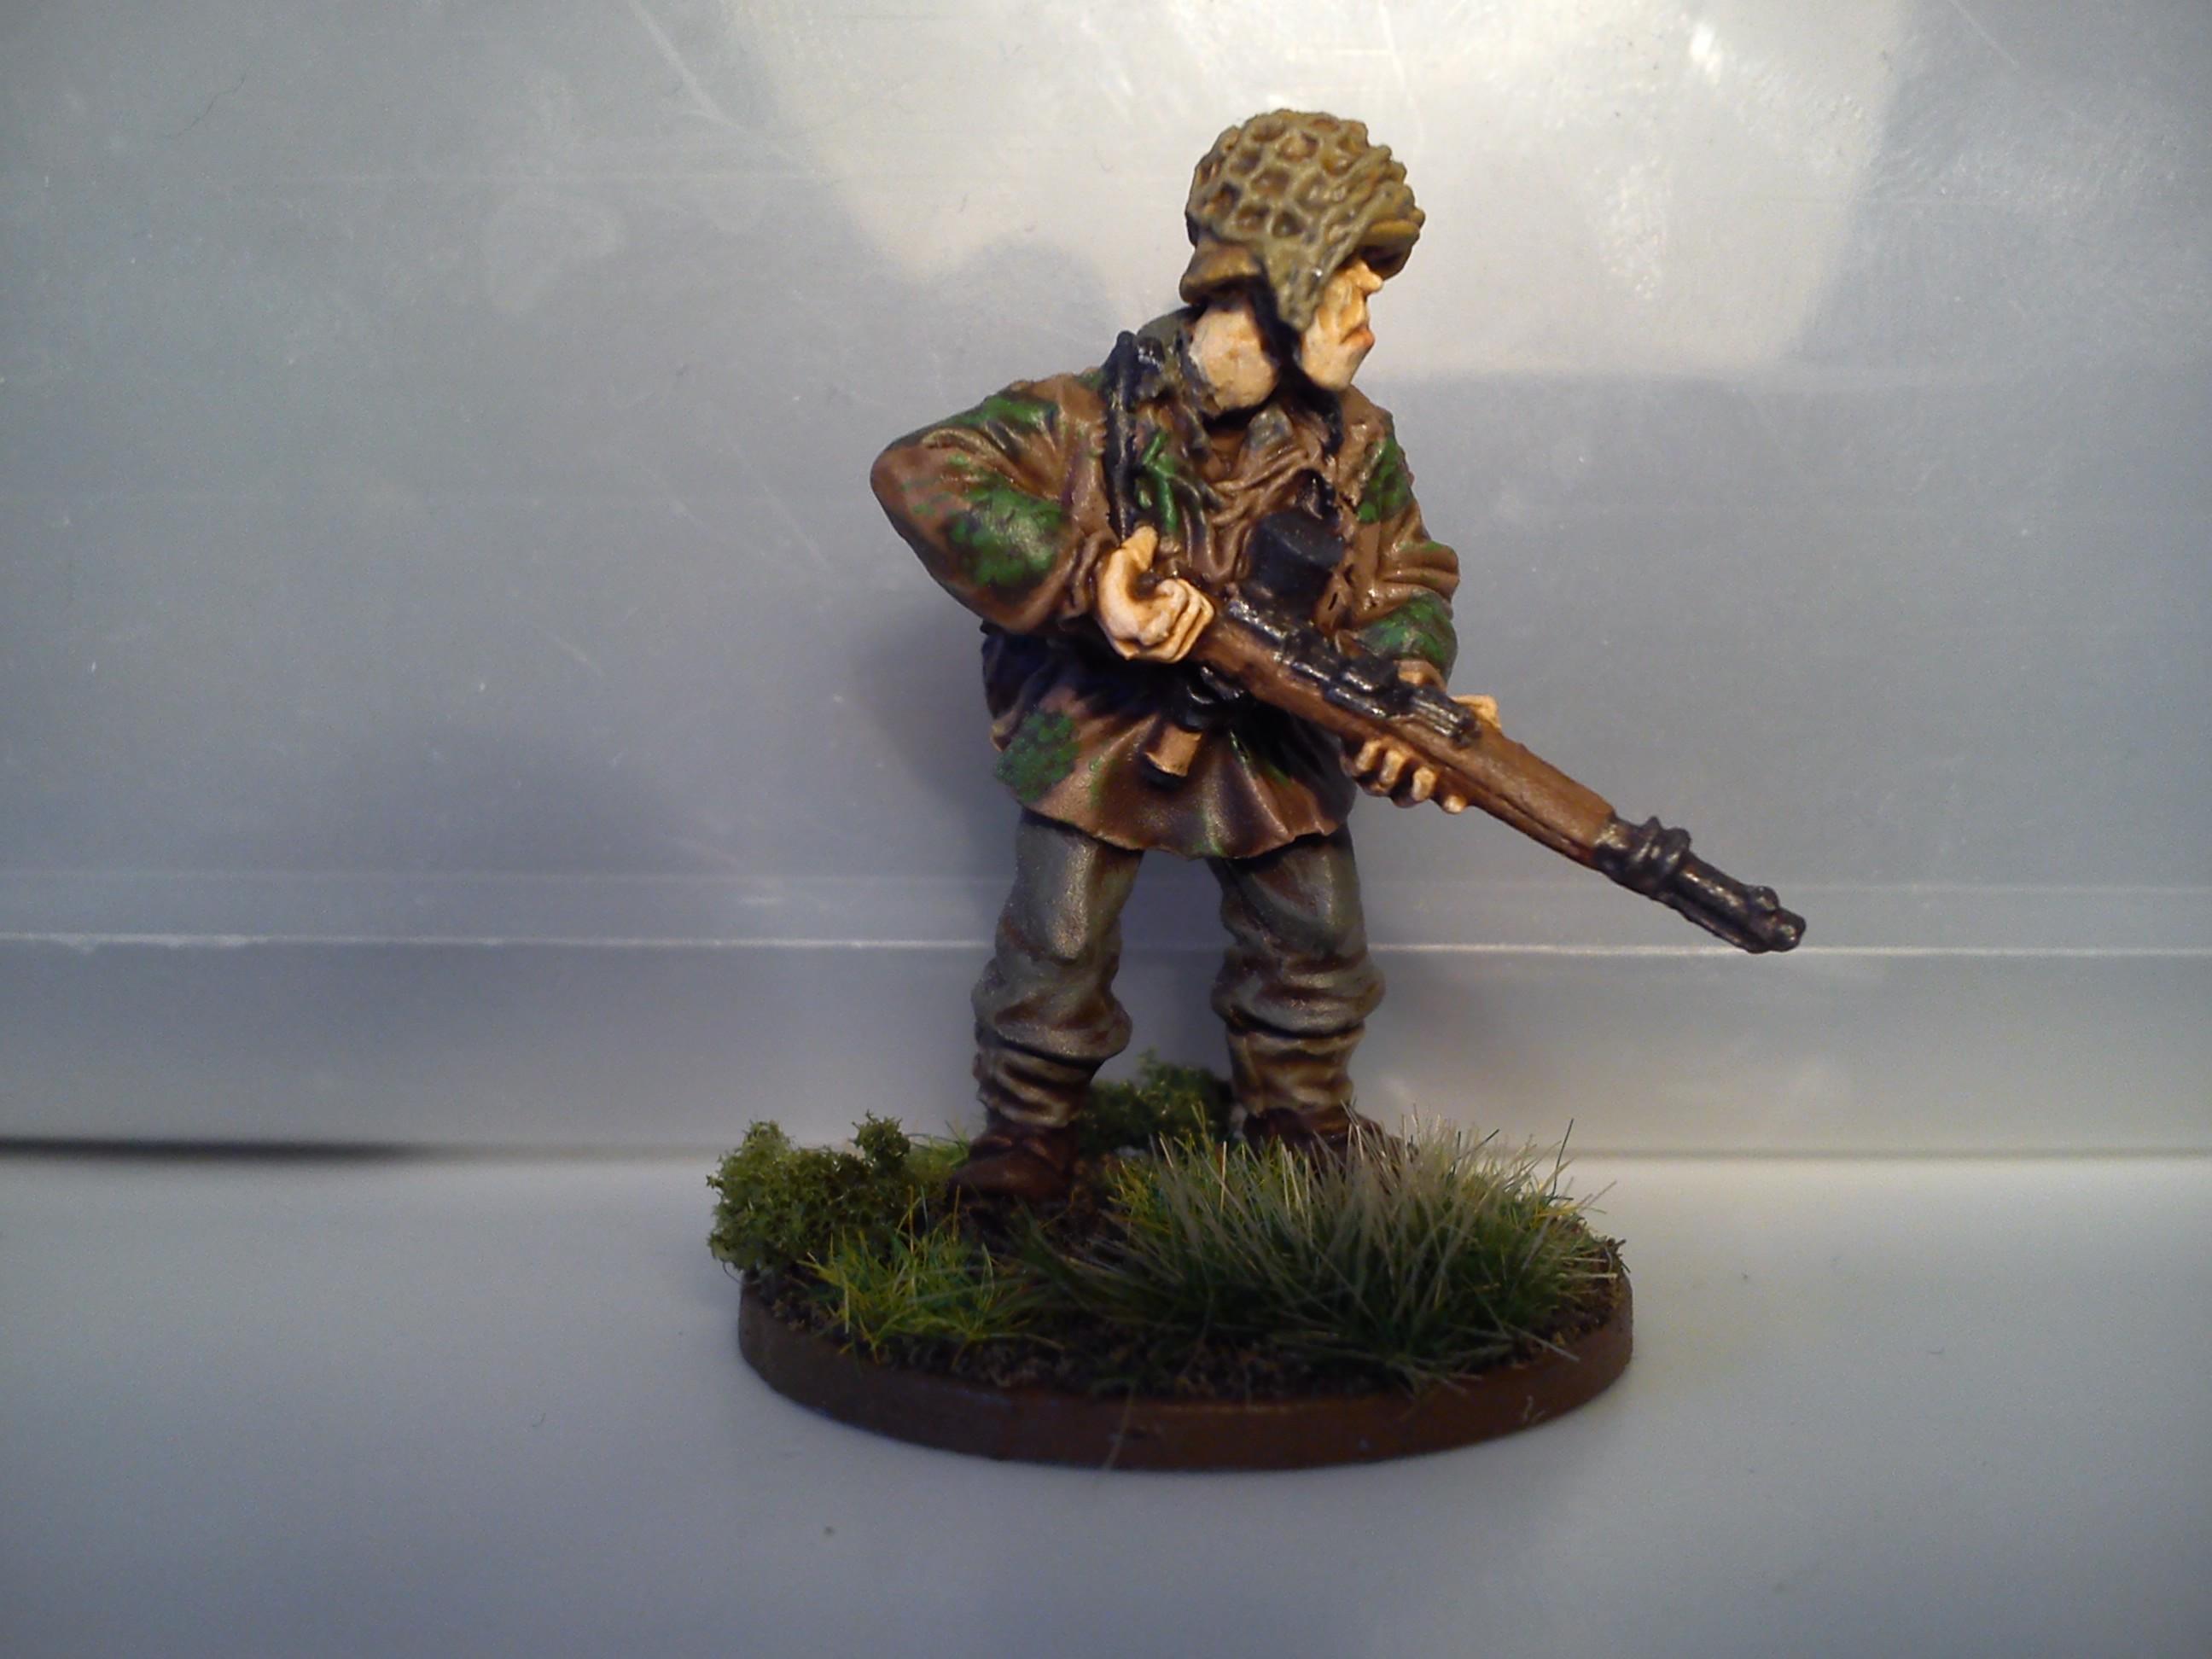 Camouflage, Ss, World War 2